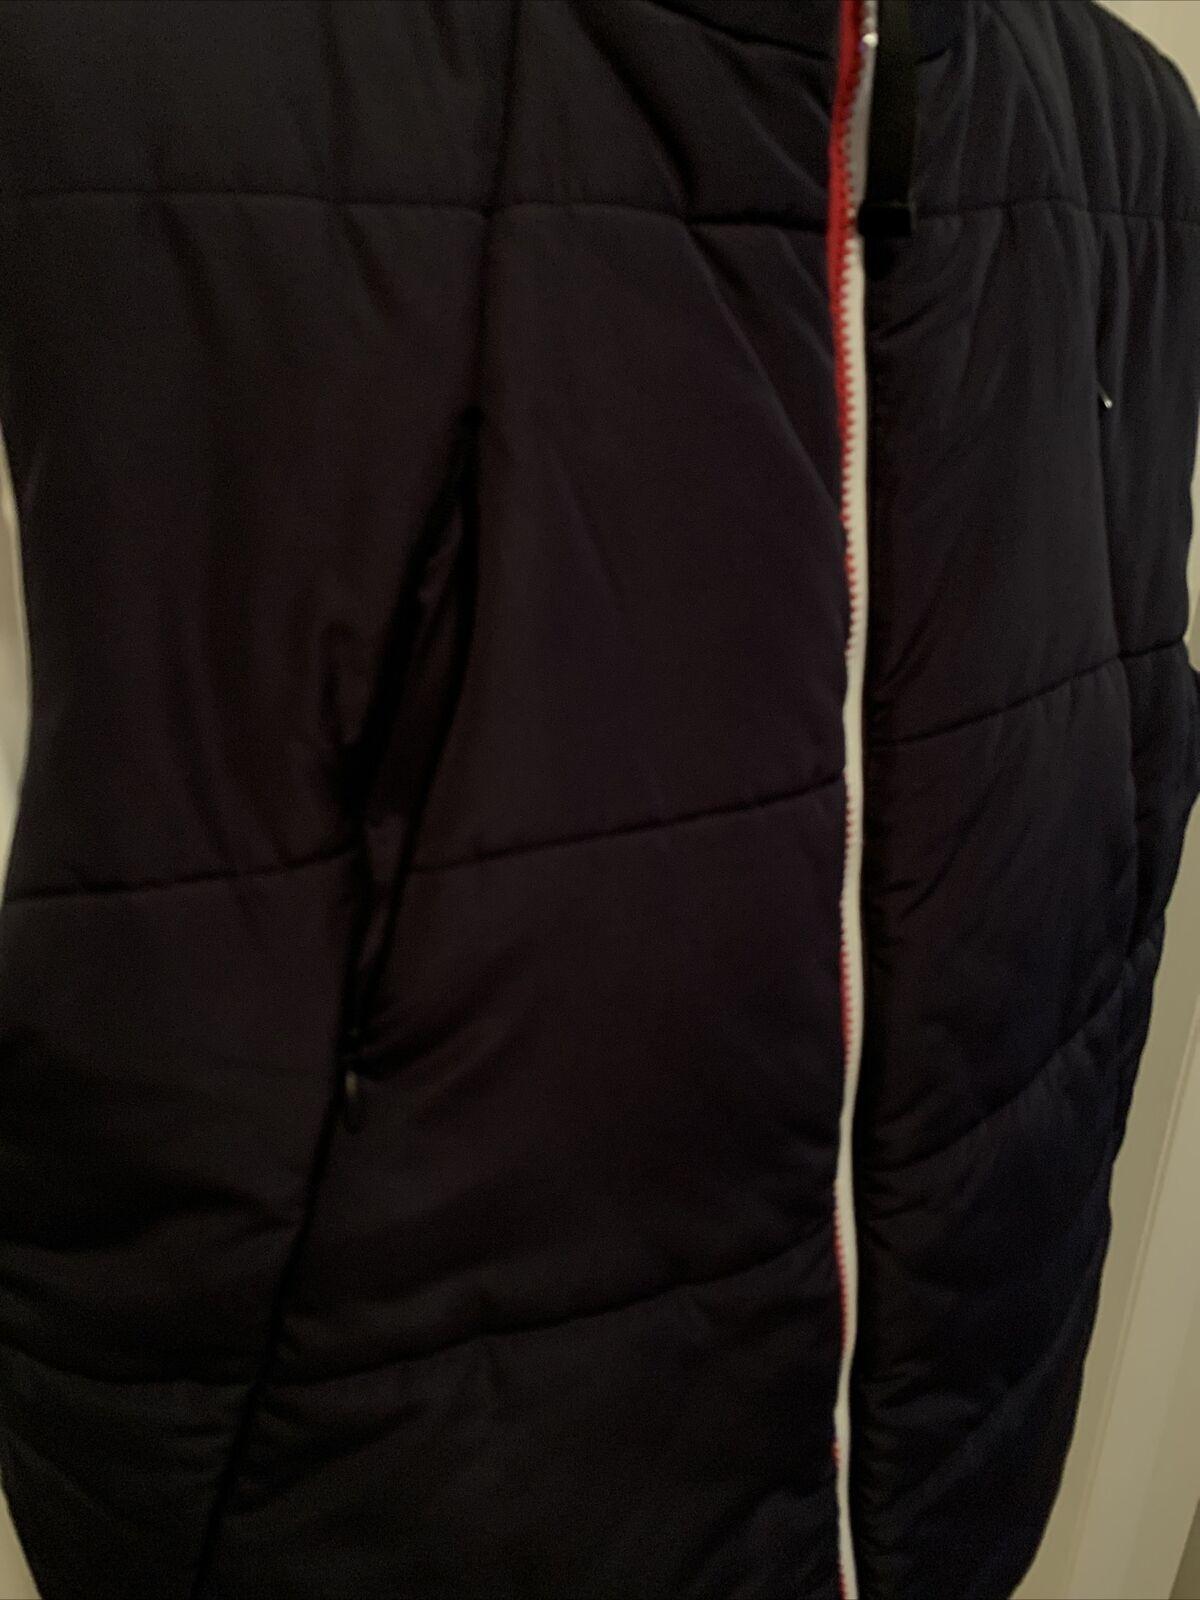 Tommy Hilfiger Mens Reversible Puffy Vest Blue/Wh… - image 8